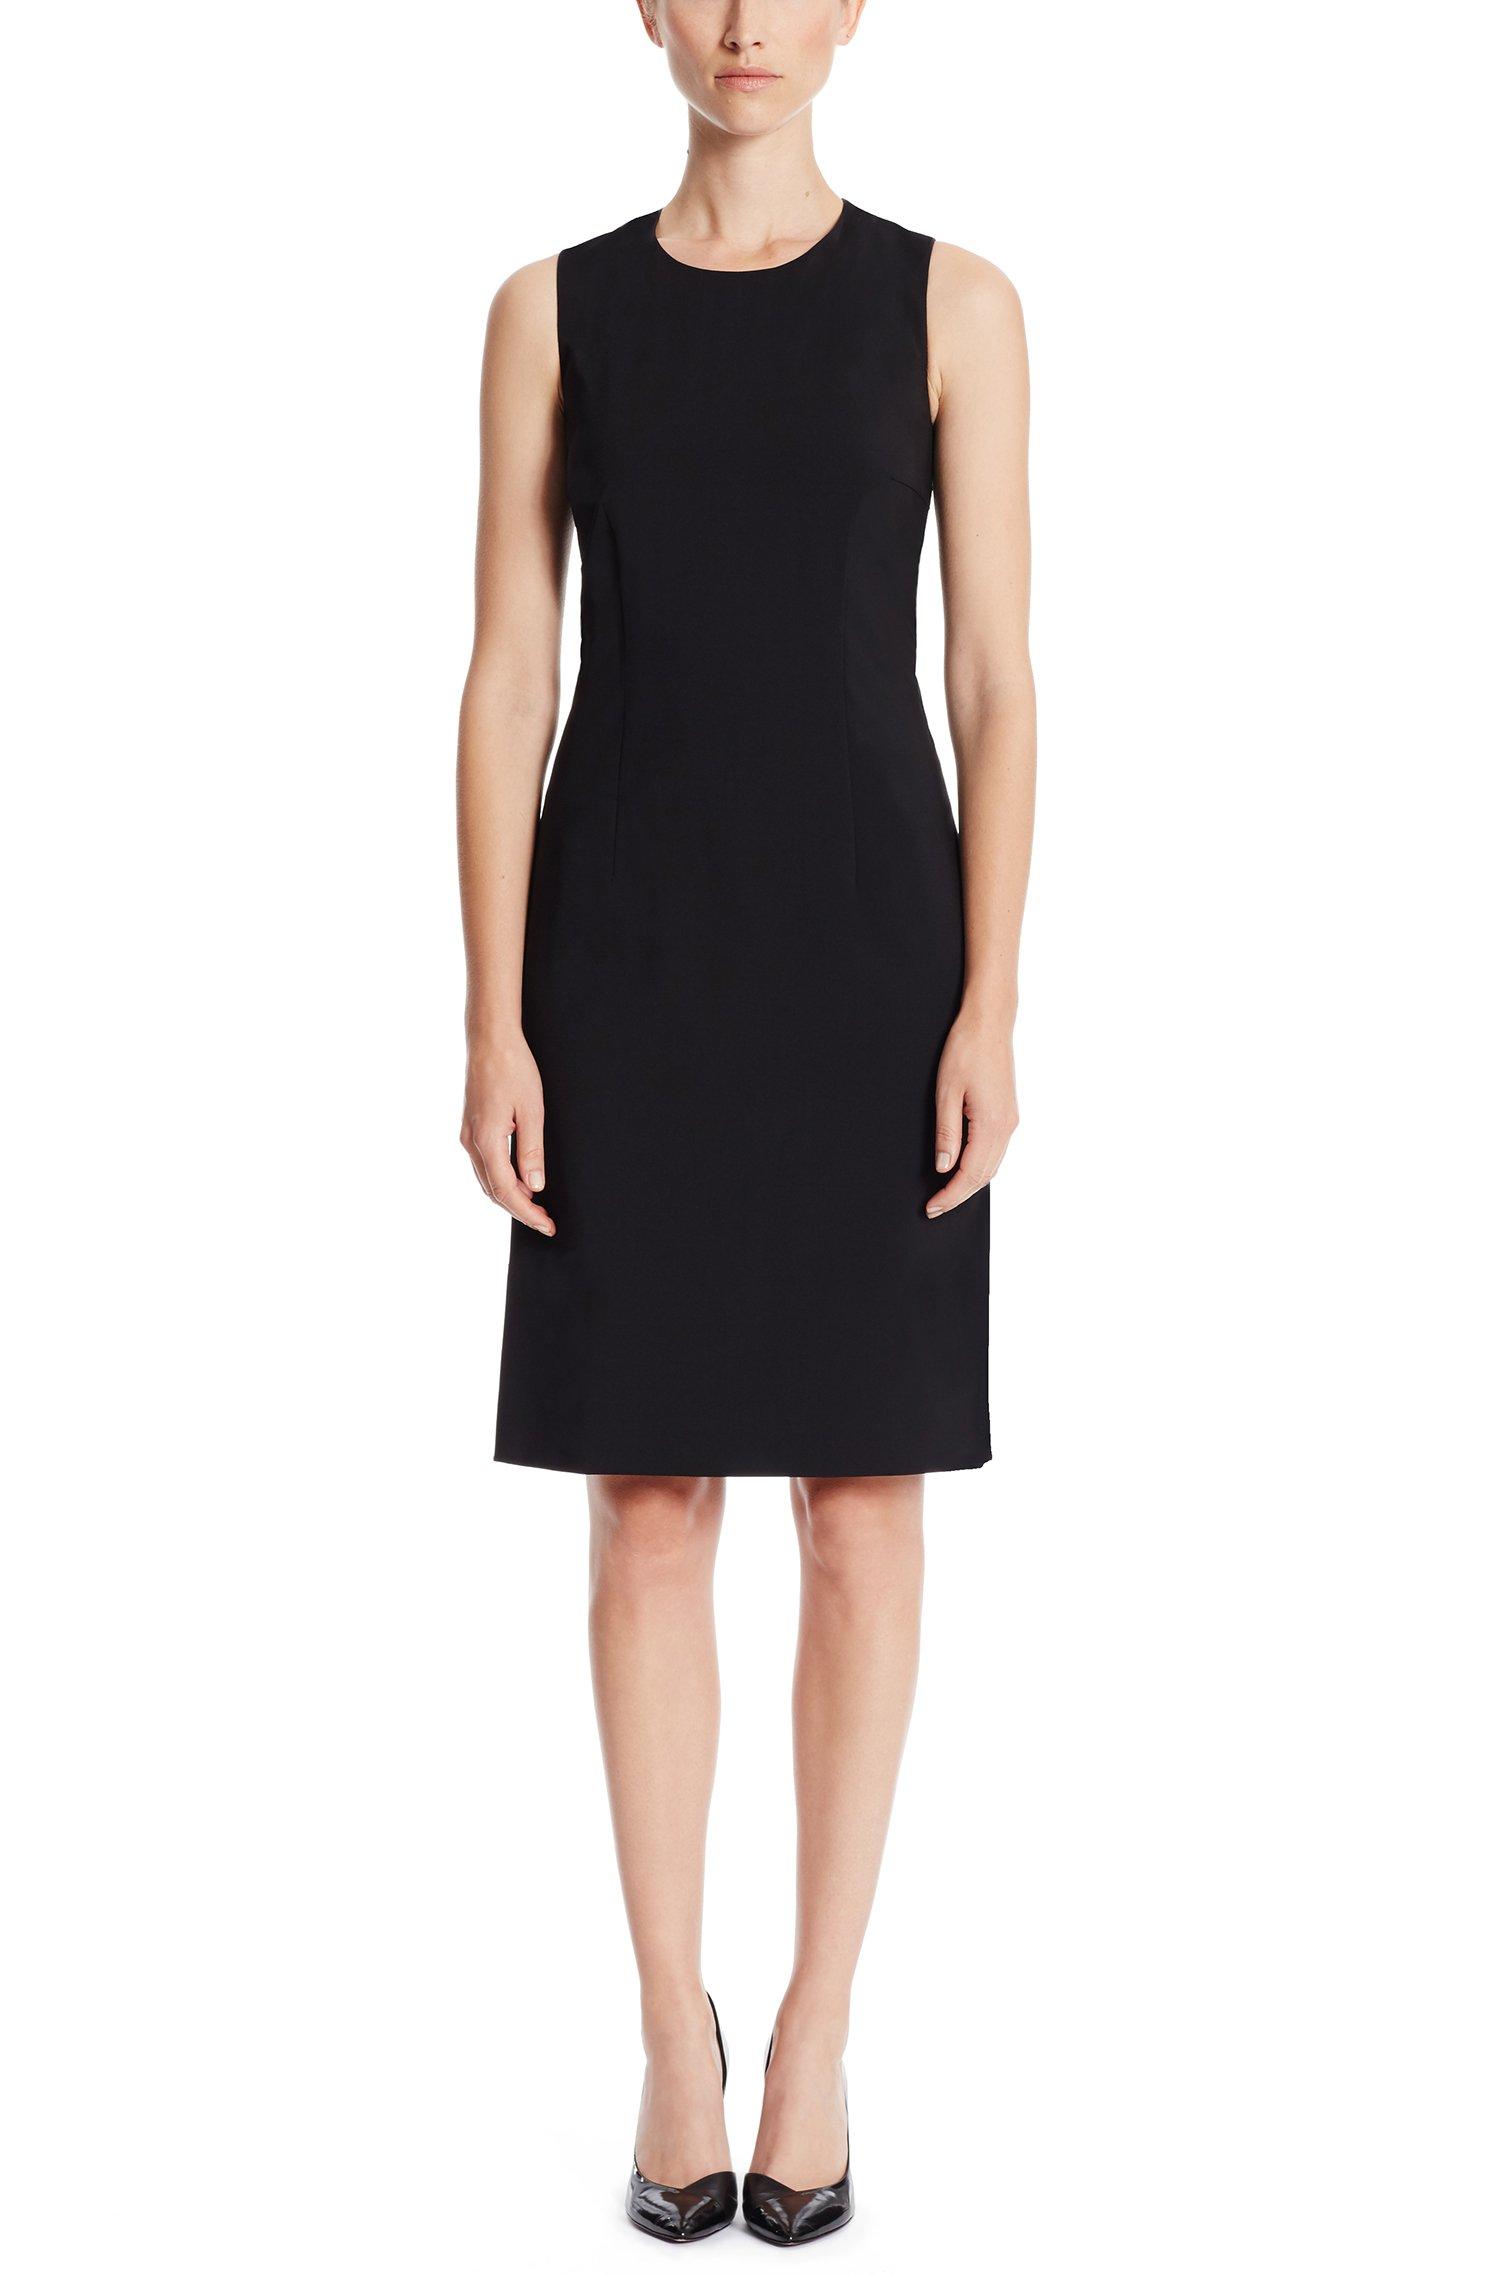 Sleeveless shift dress in Italian stretch wool, Black